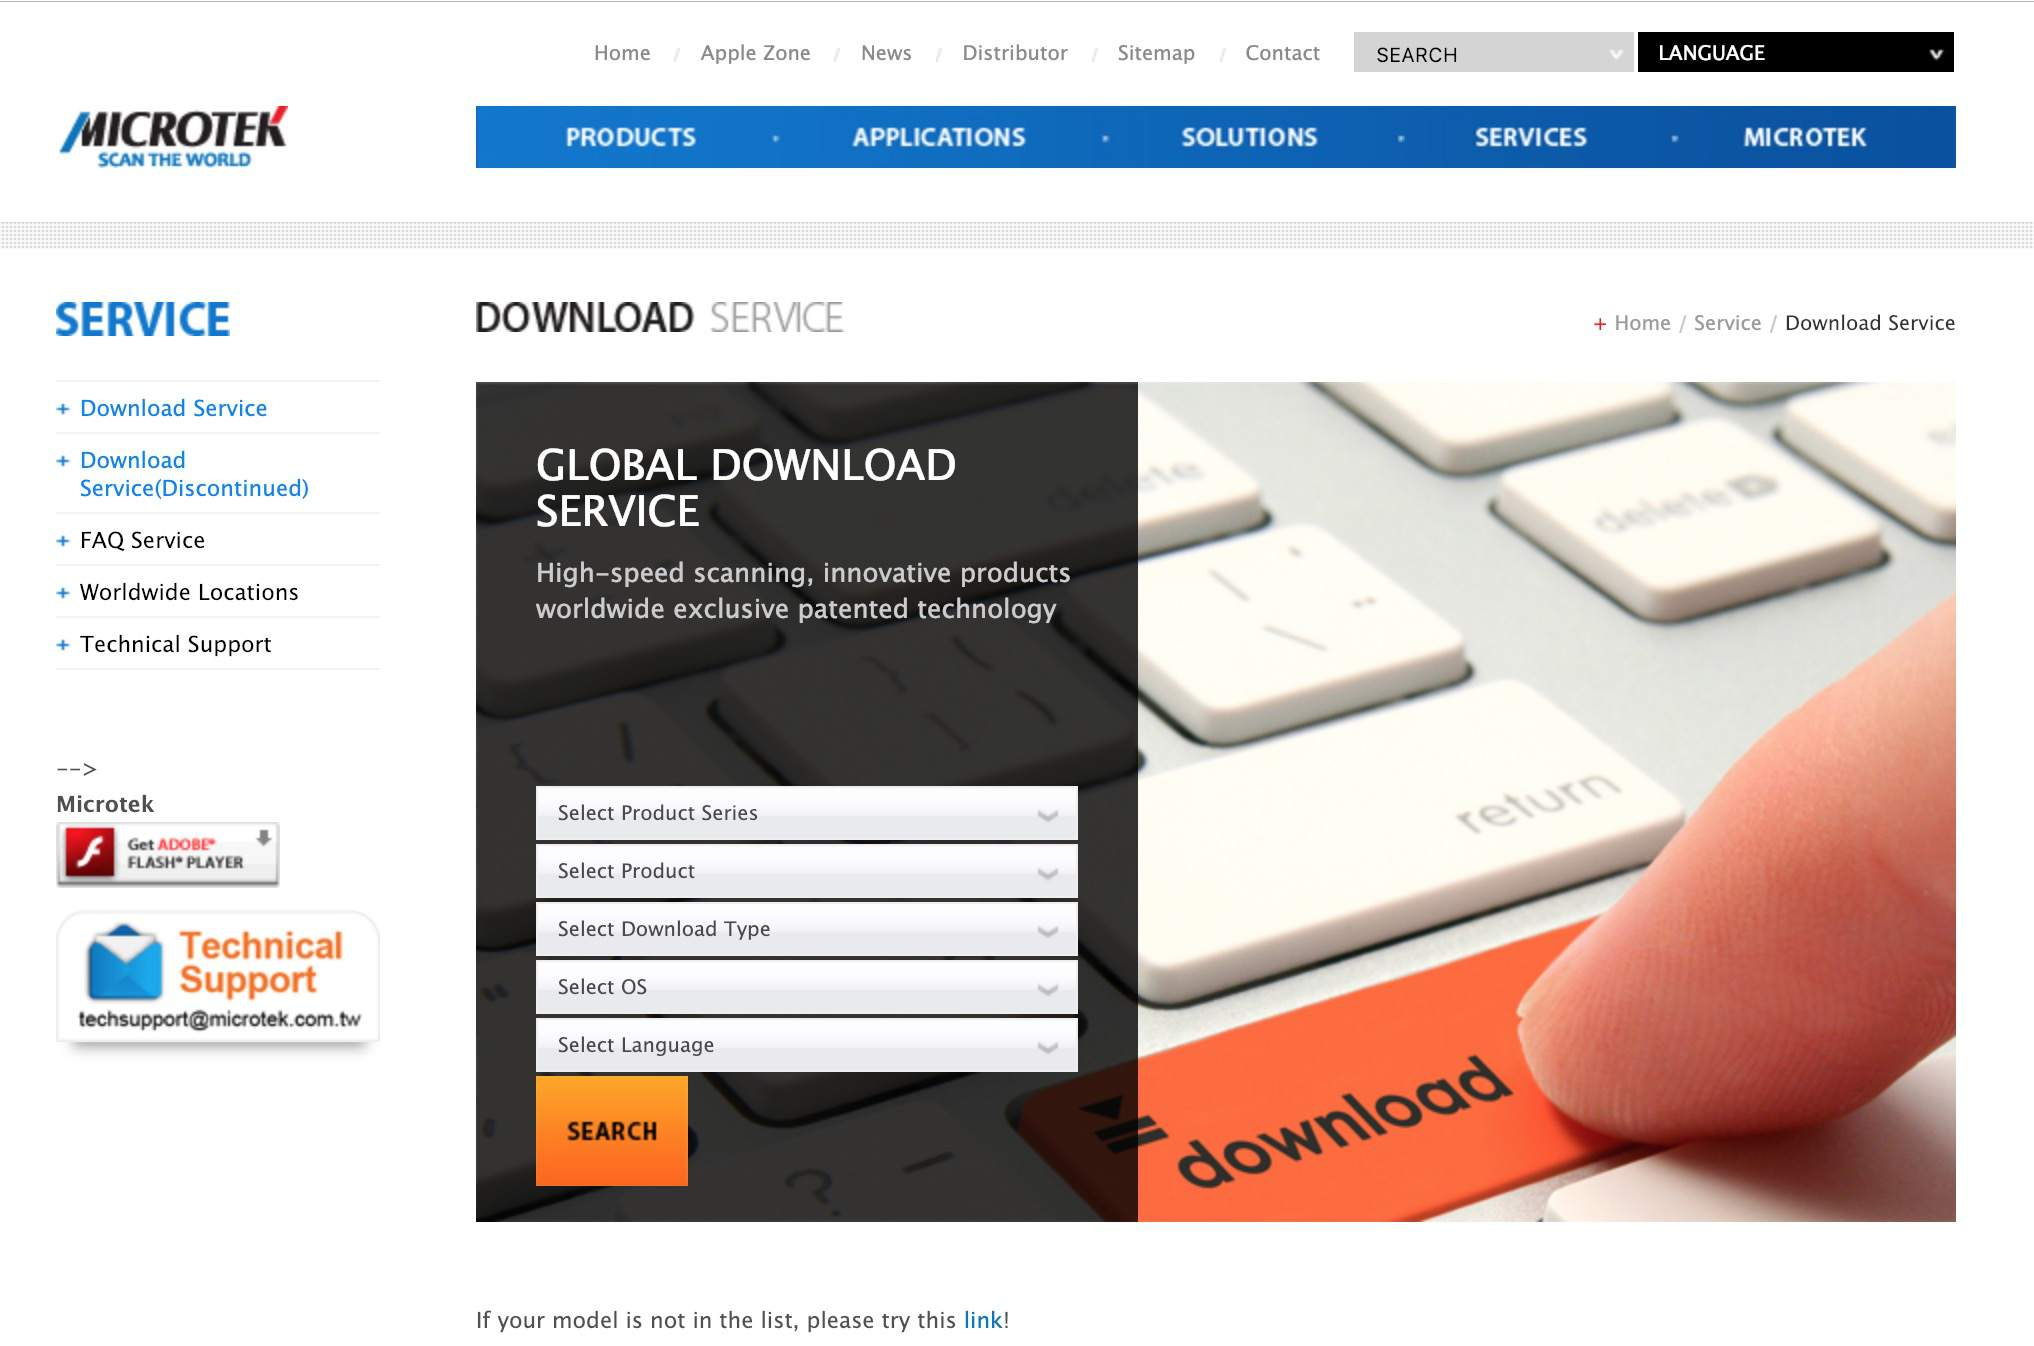 Microtek global download service page